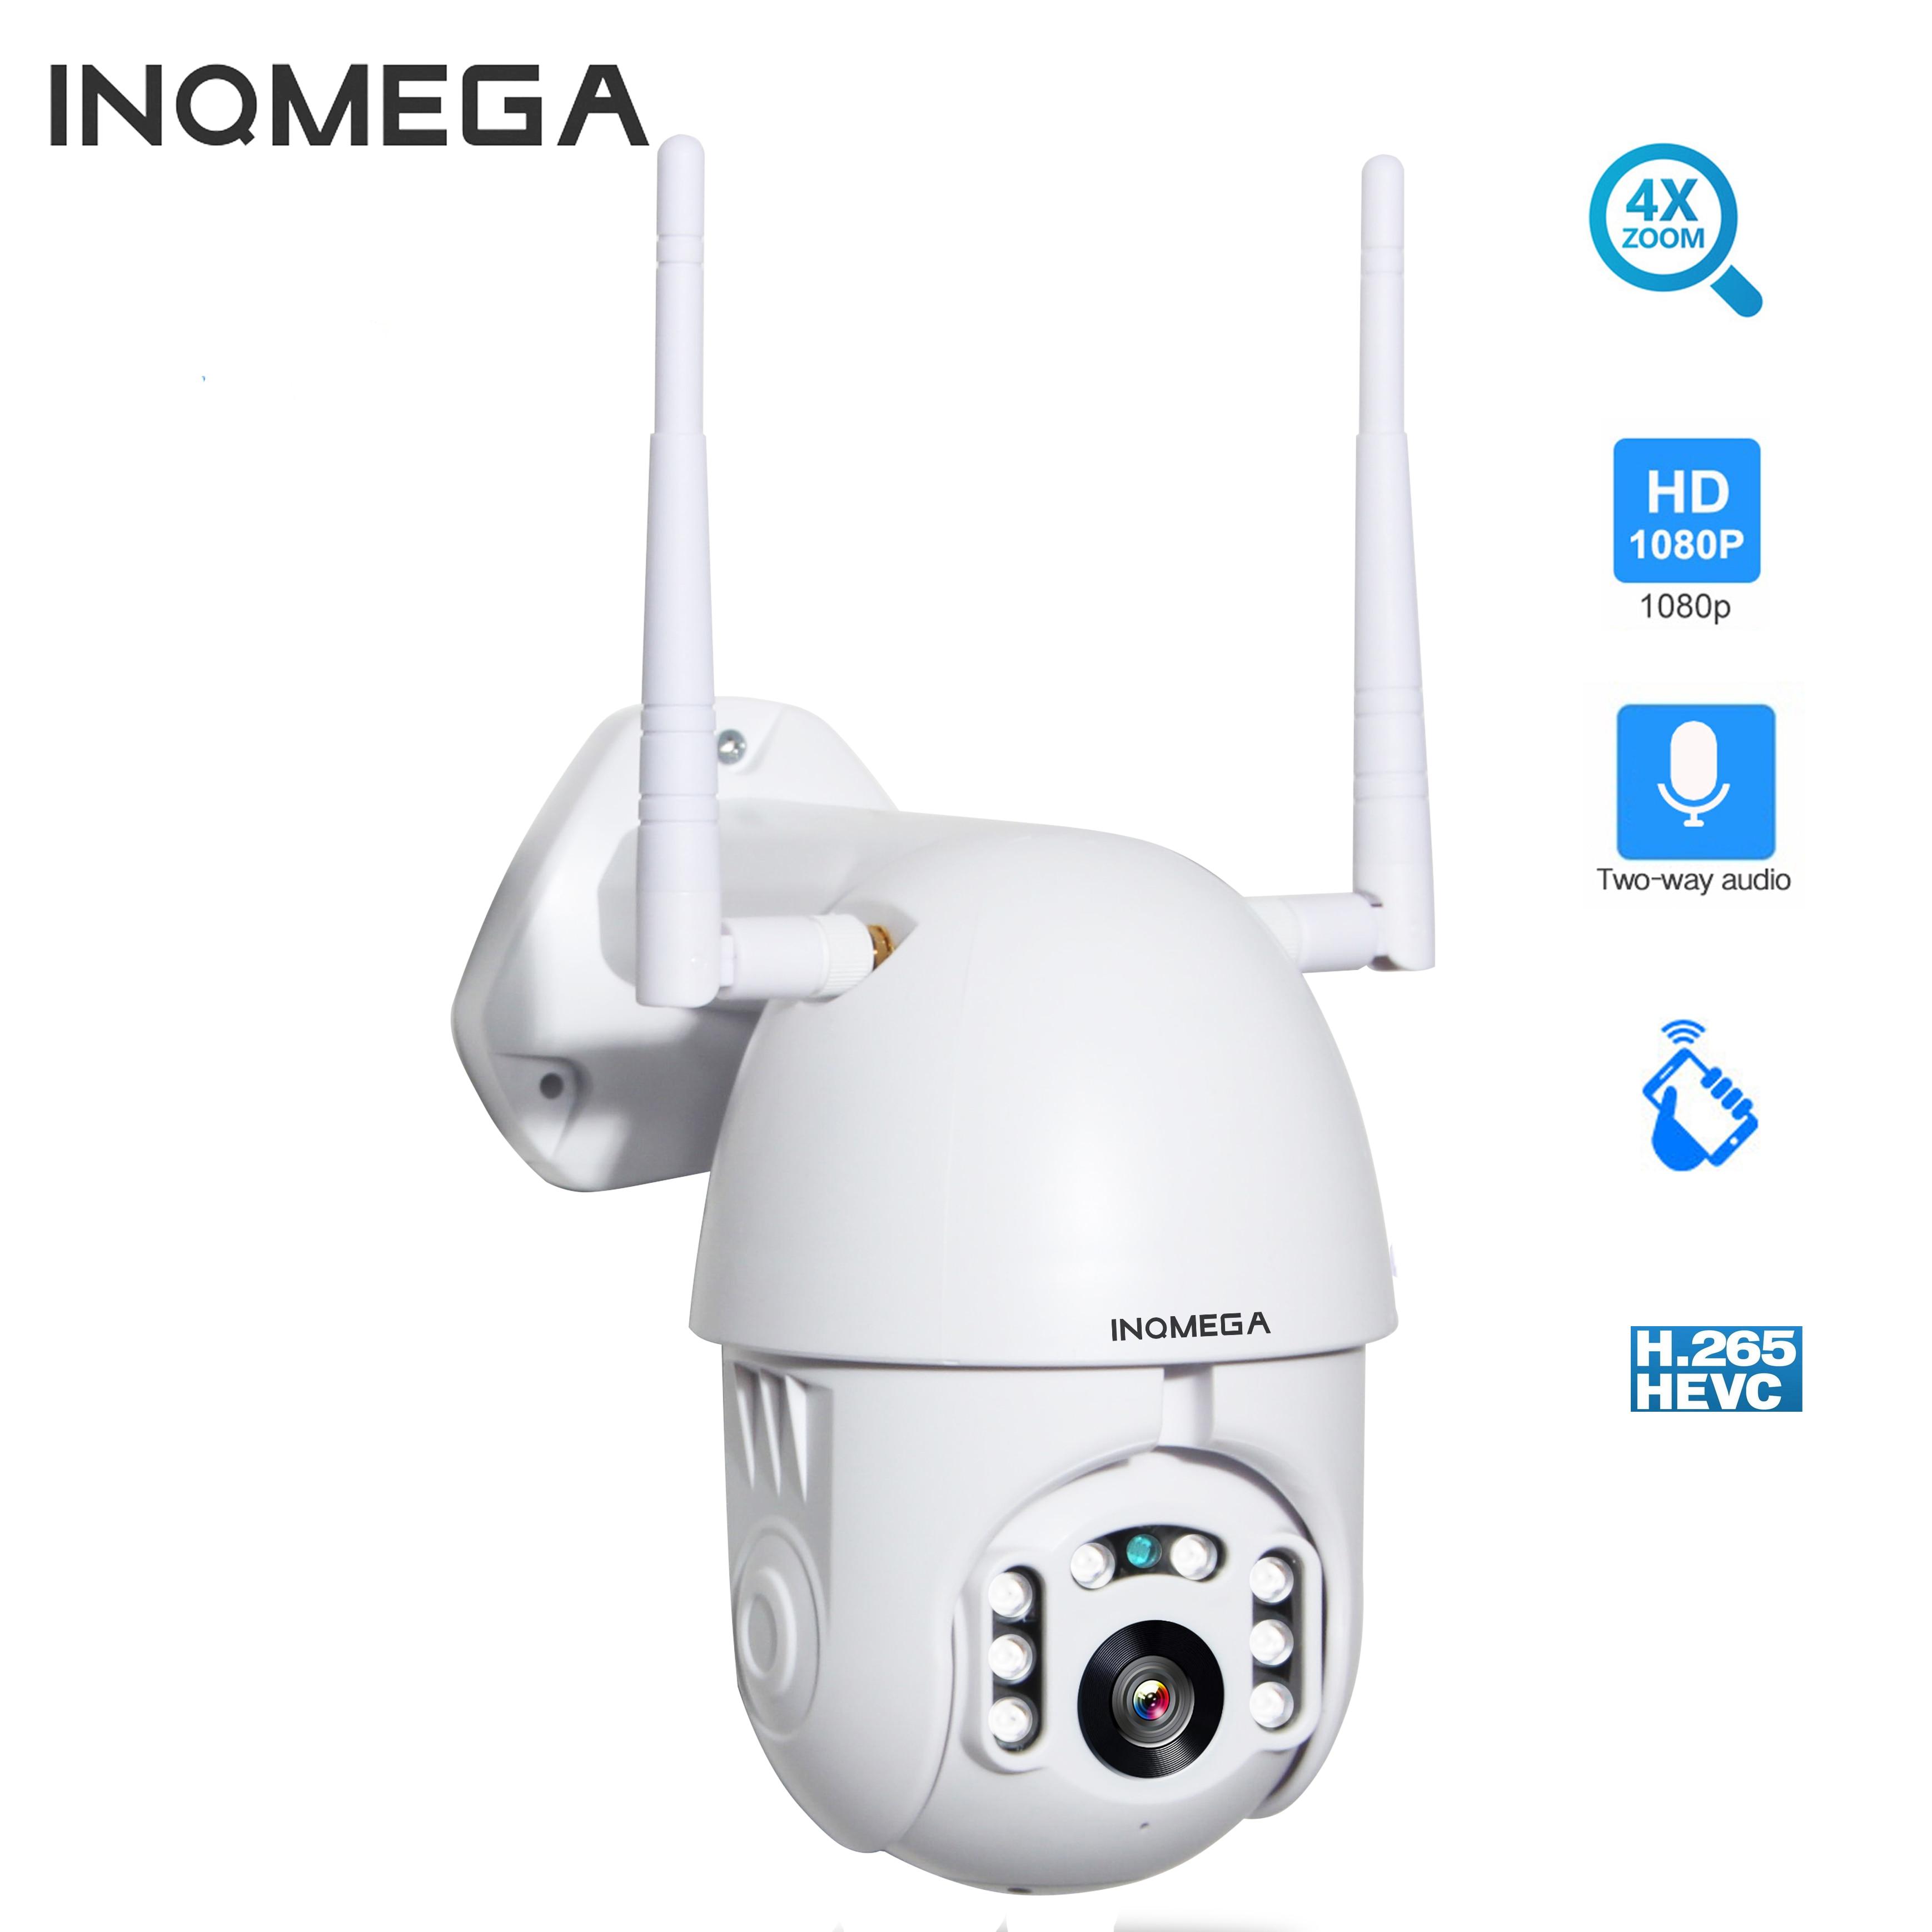 INQMEGA 4X Digital Zoom H.265X 1080p PTZ IP Camera Outdoor  Speed Dome CCTV Security Cameras  WIFI Exterior IR Home Surveilance